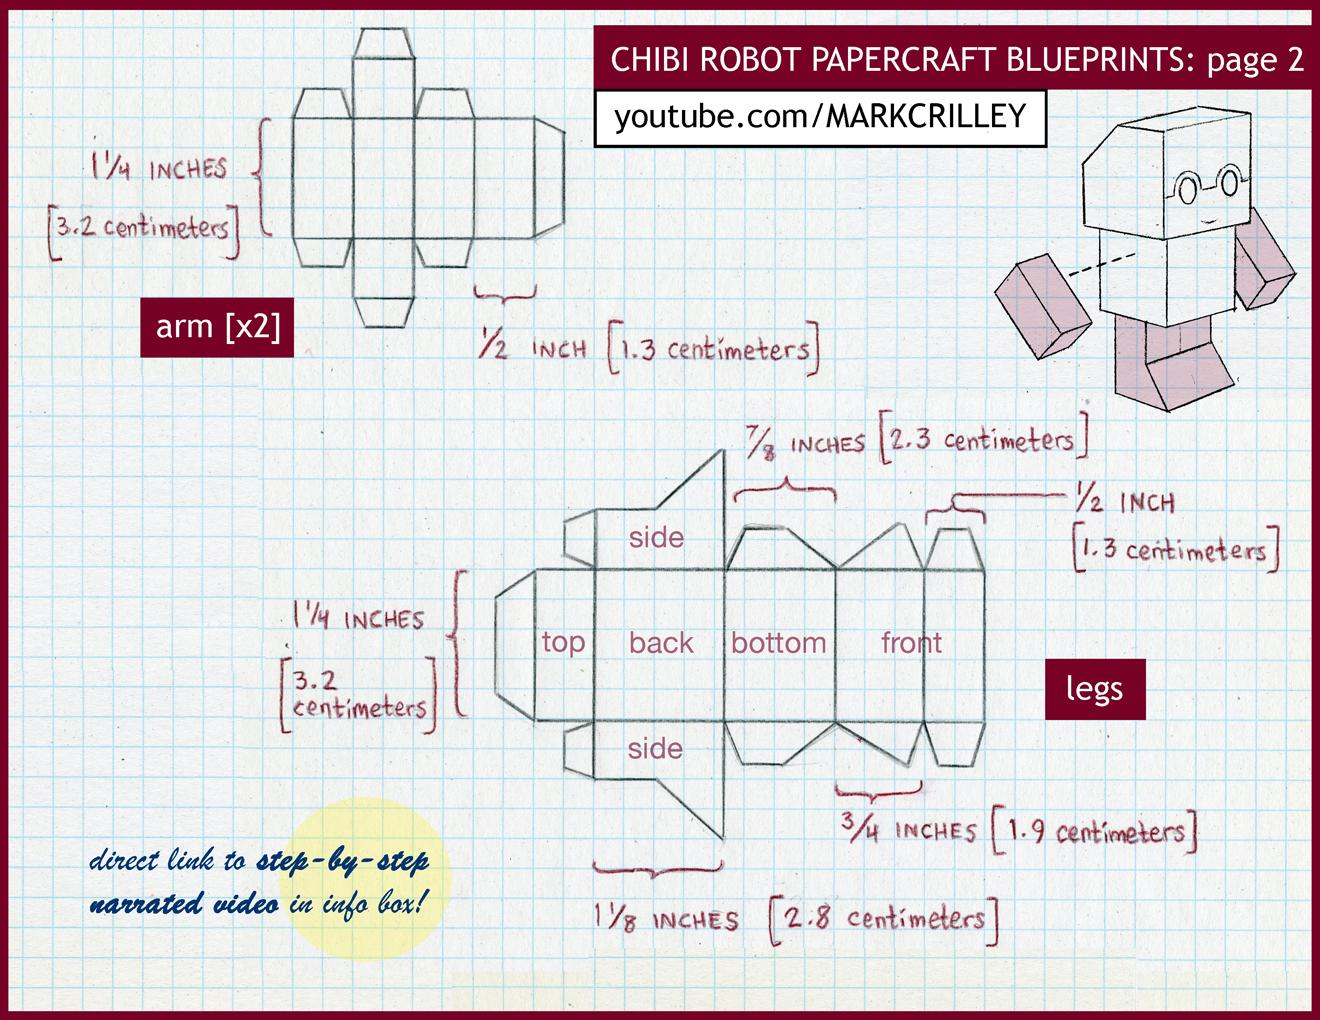 Chibi Robot Papercraft Blue Print 2